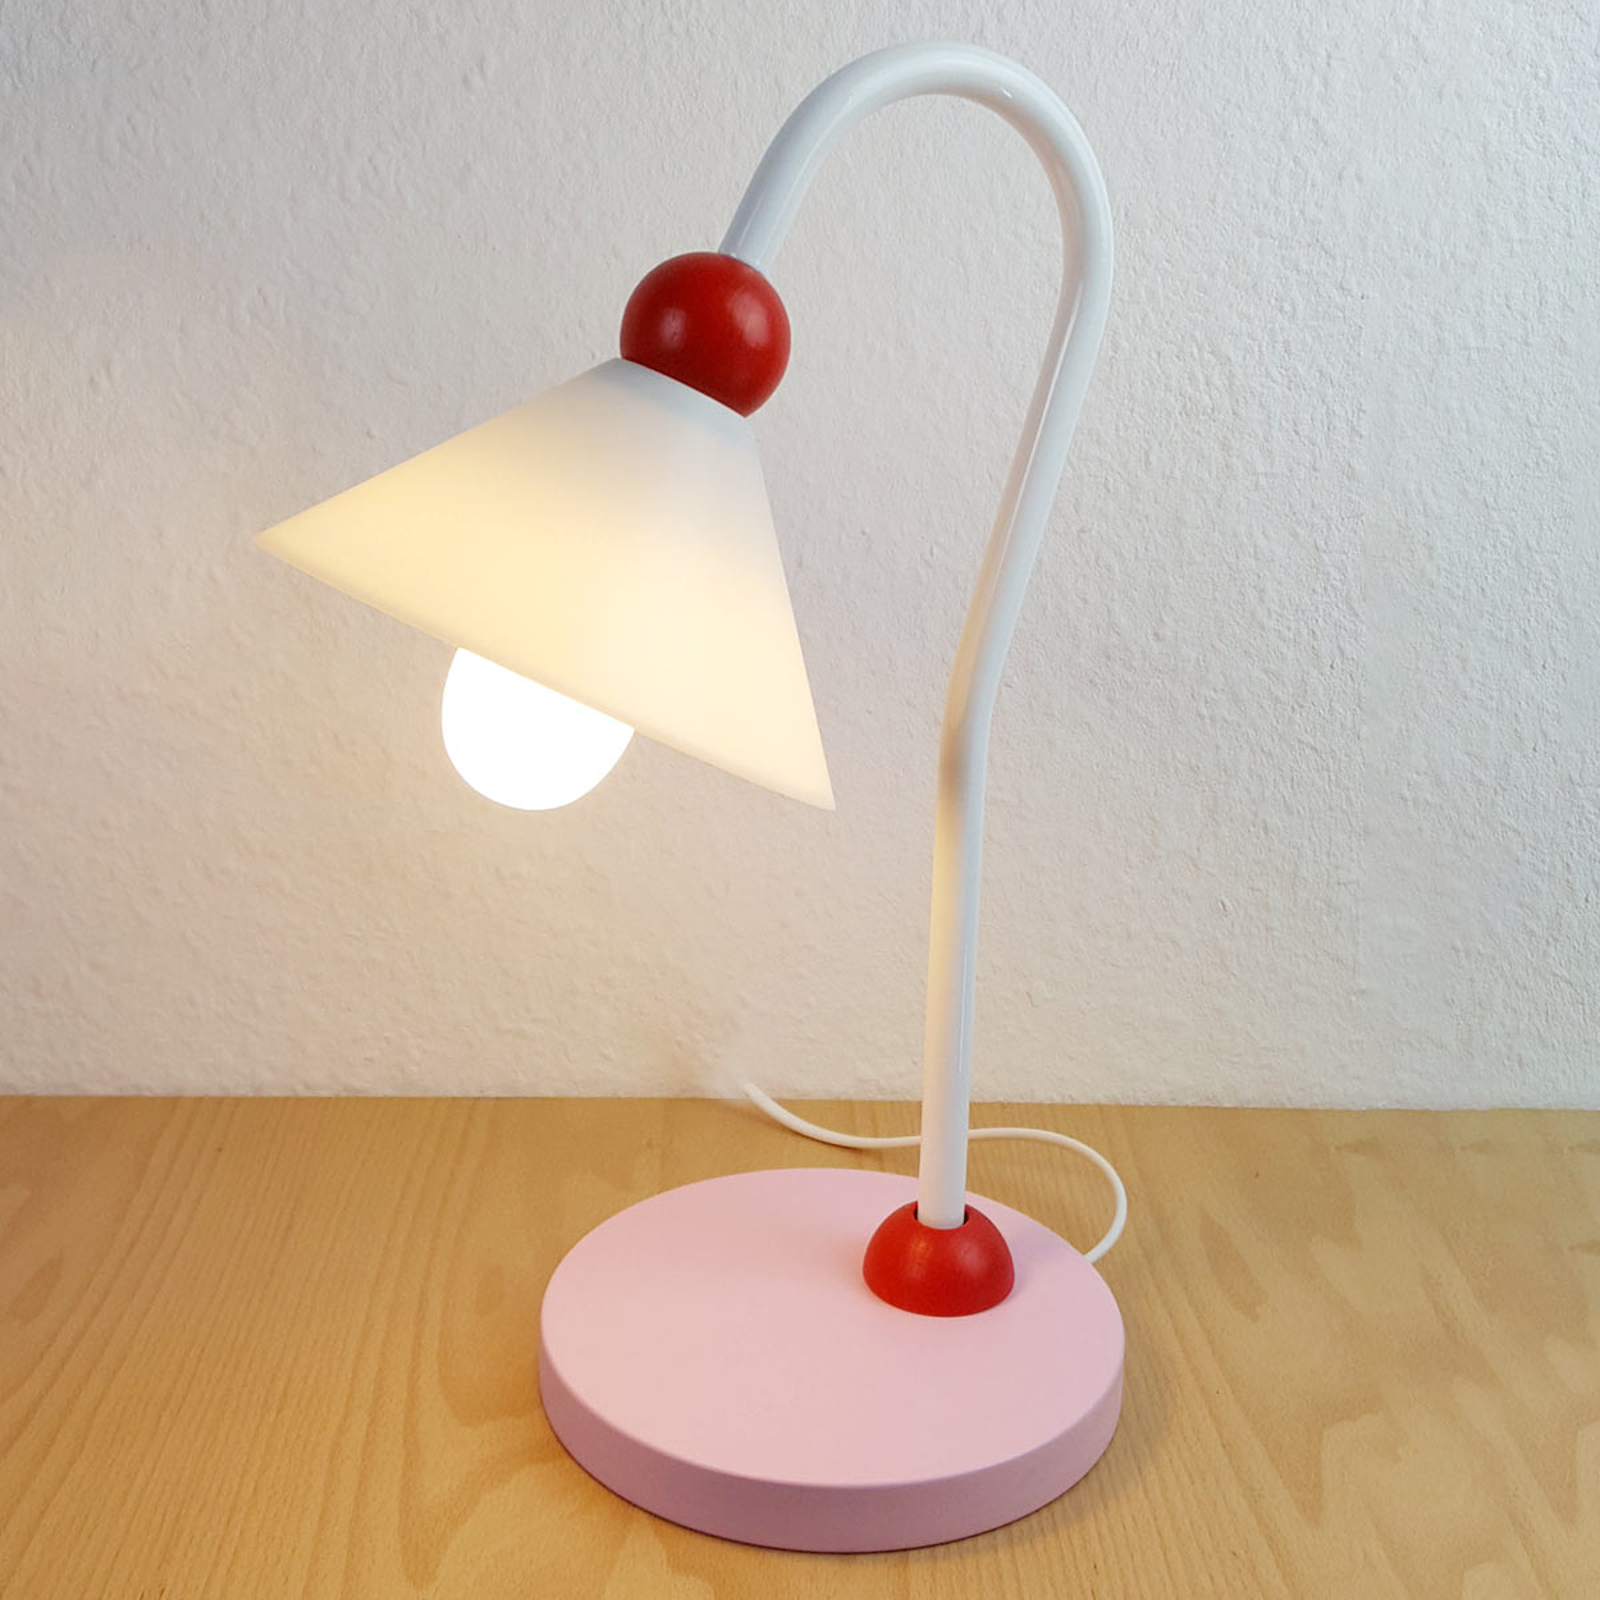 Charmante lampe à poser-liseuse Princesse, rose